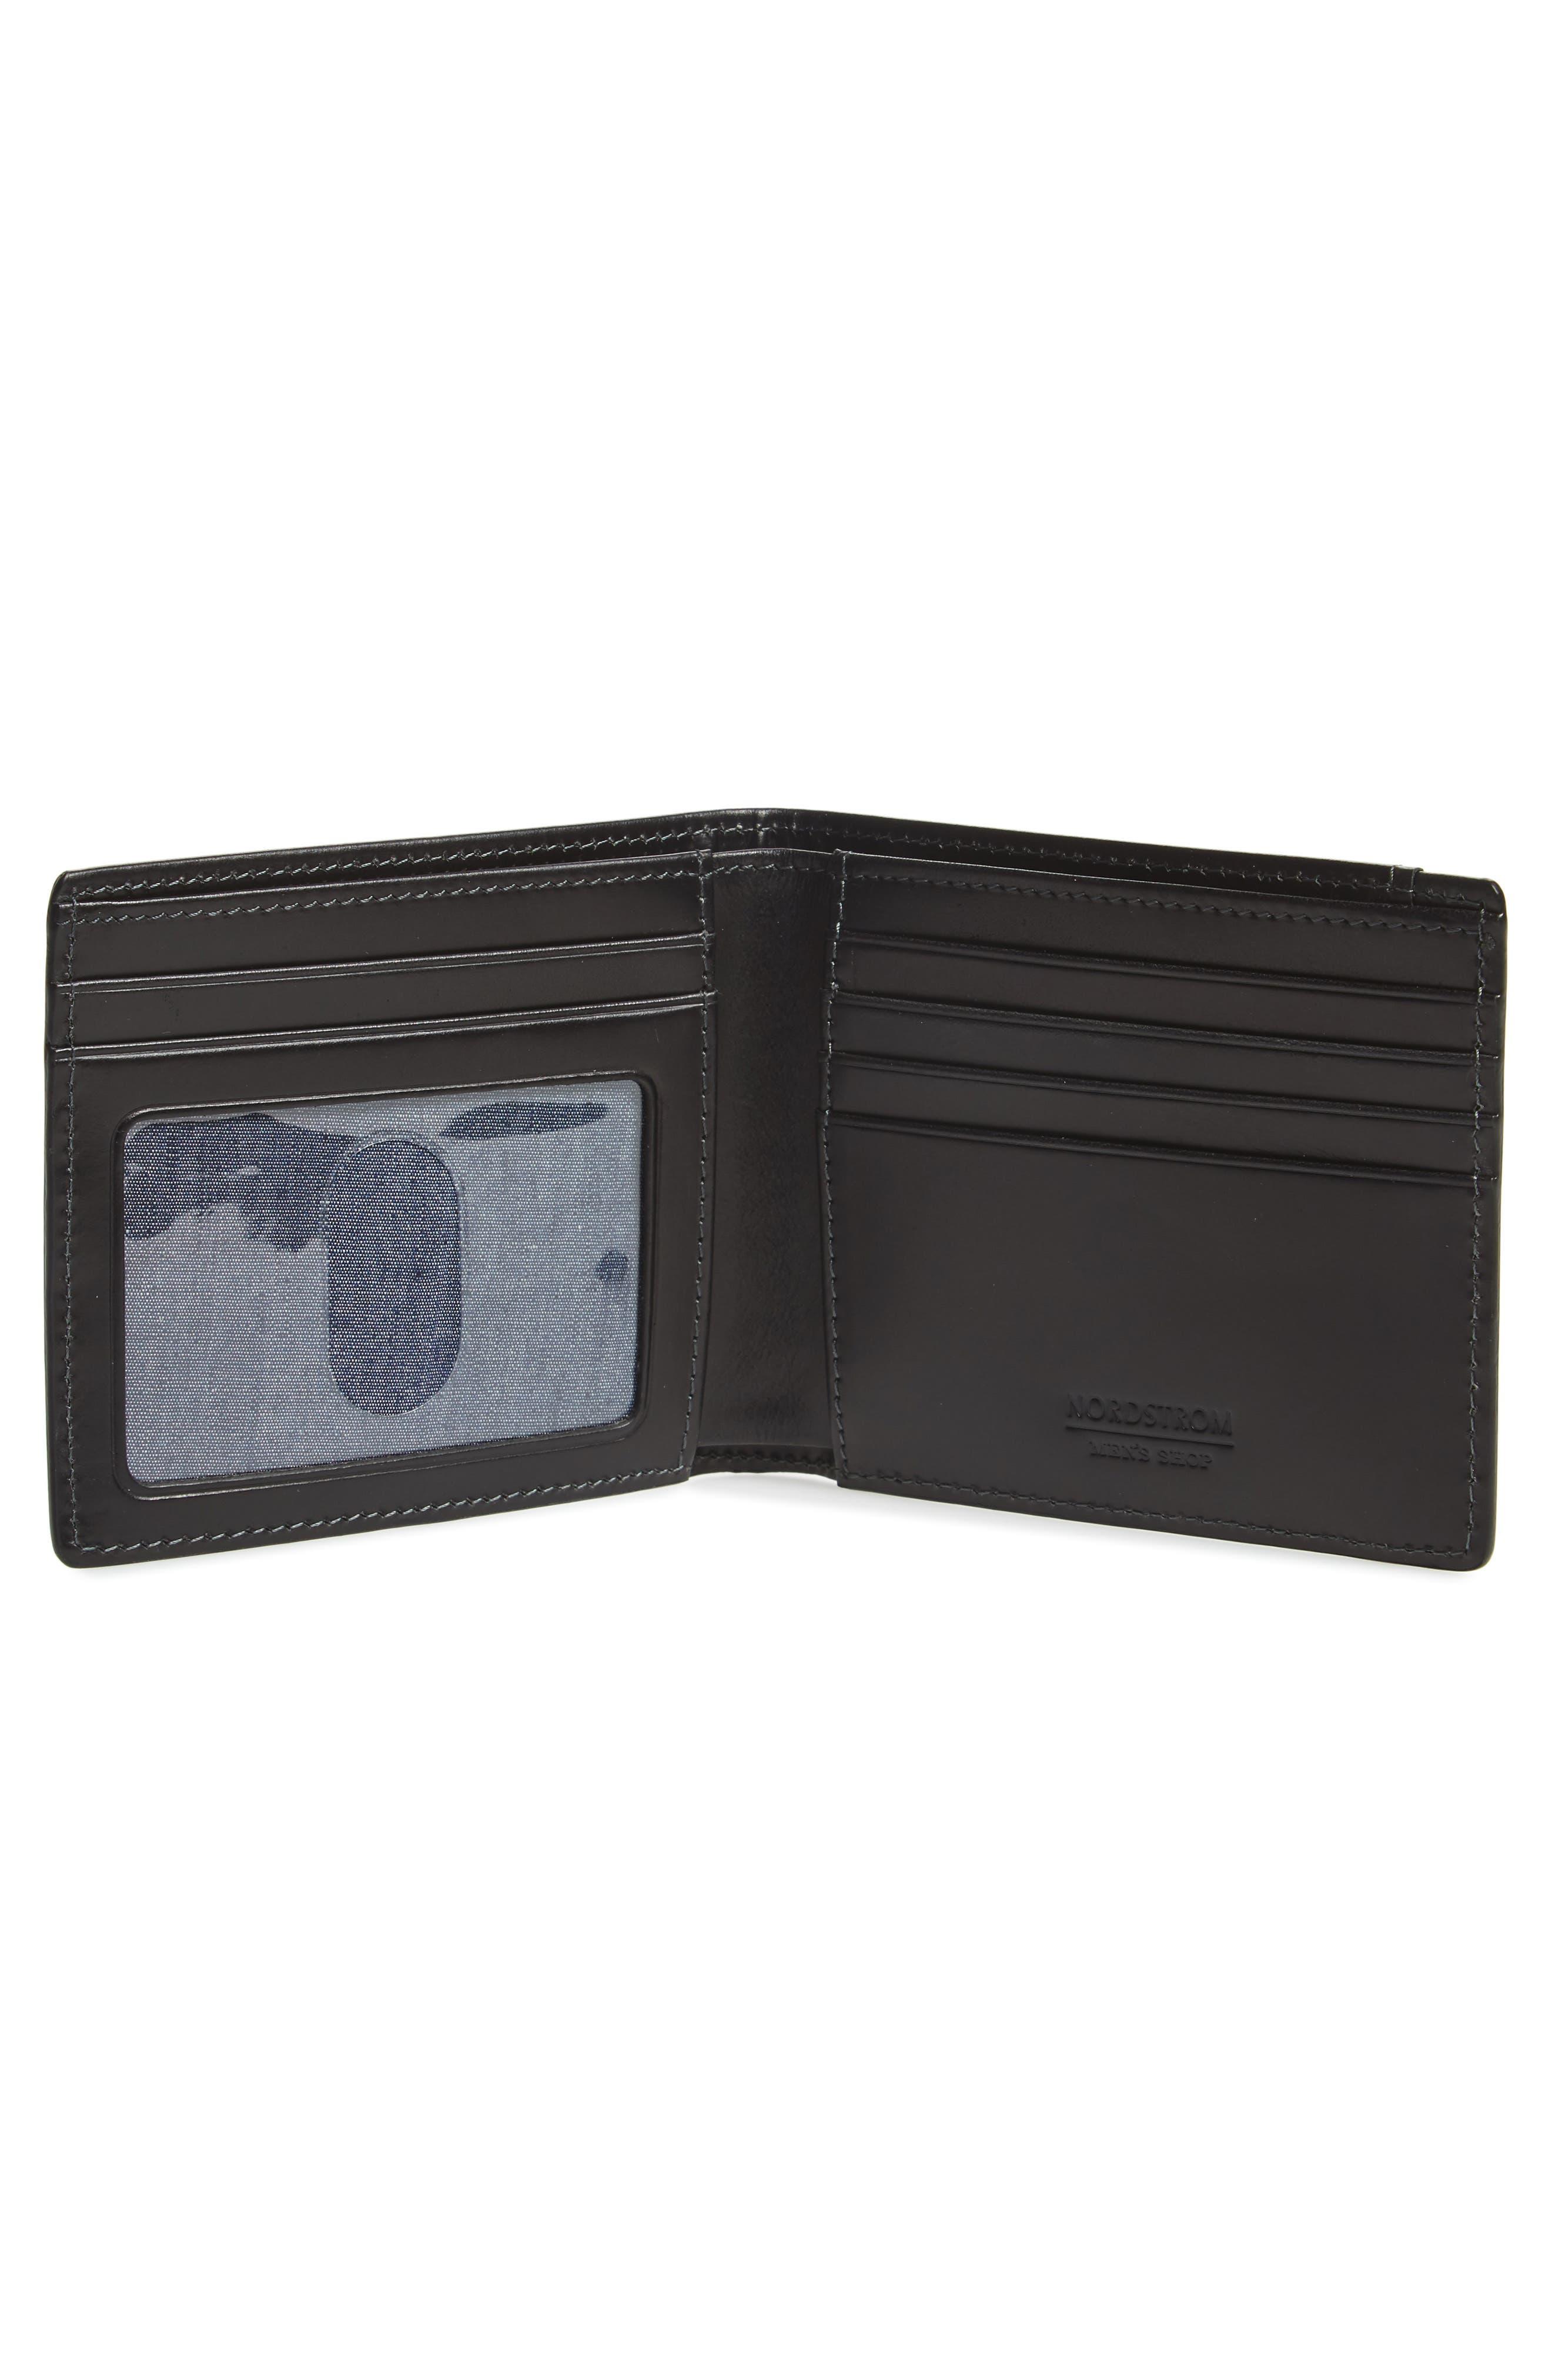 Wyatt RFID Leather Wallet,                             Alternate thumbnail 2, color,                             BLACK